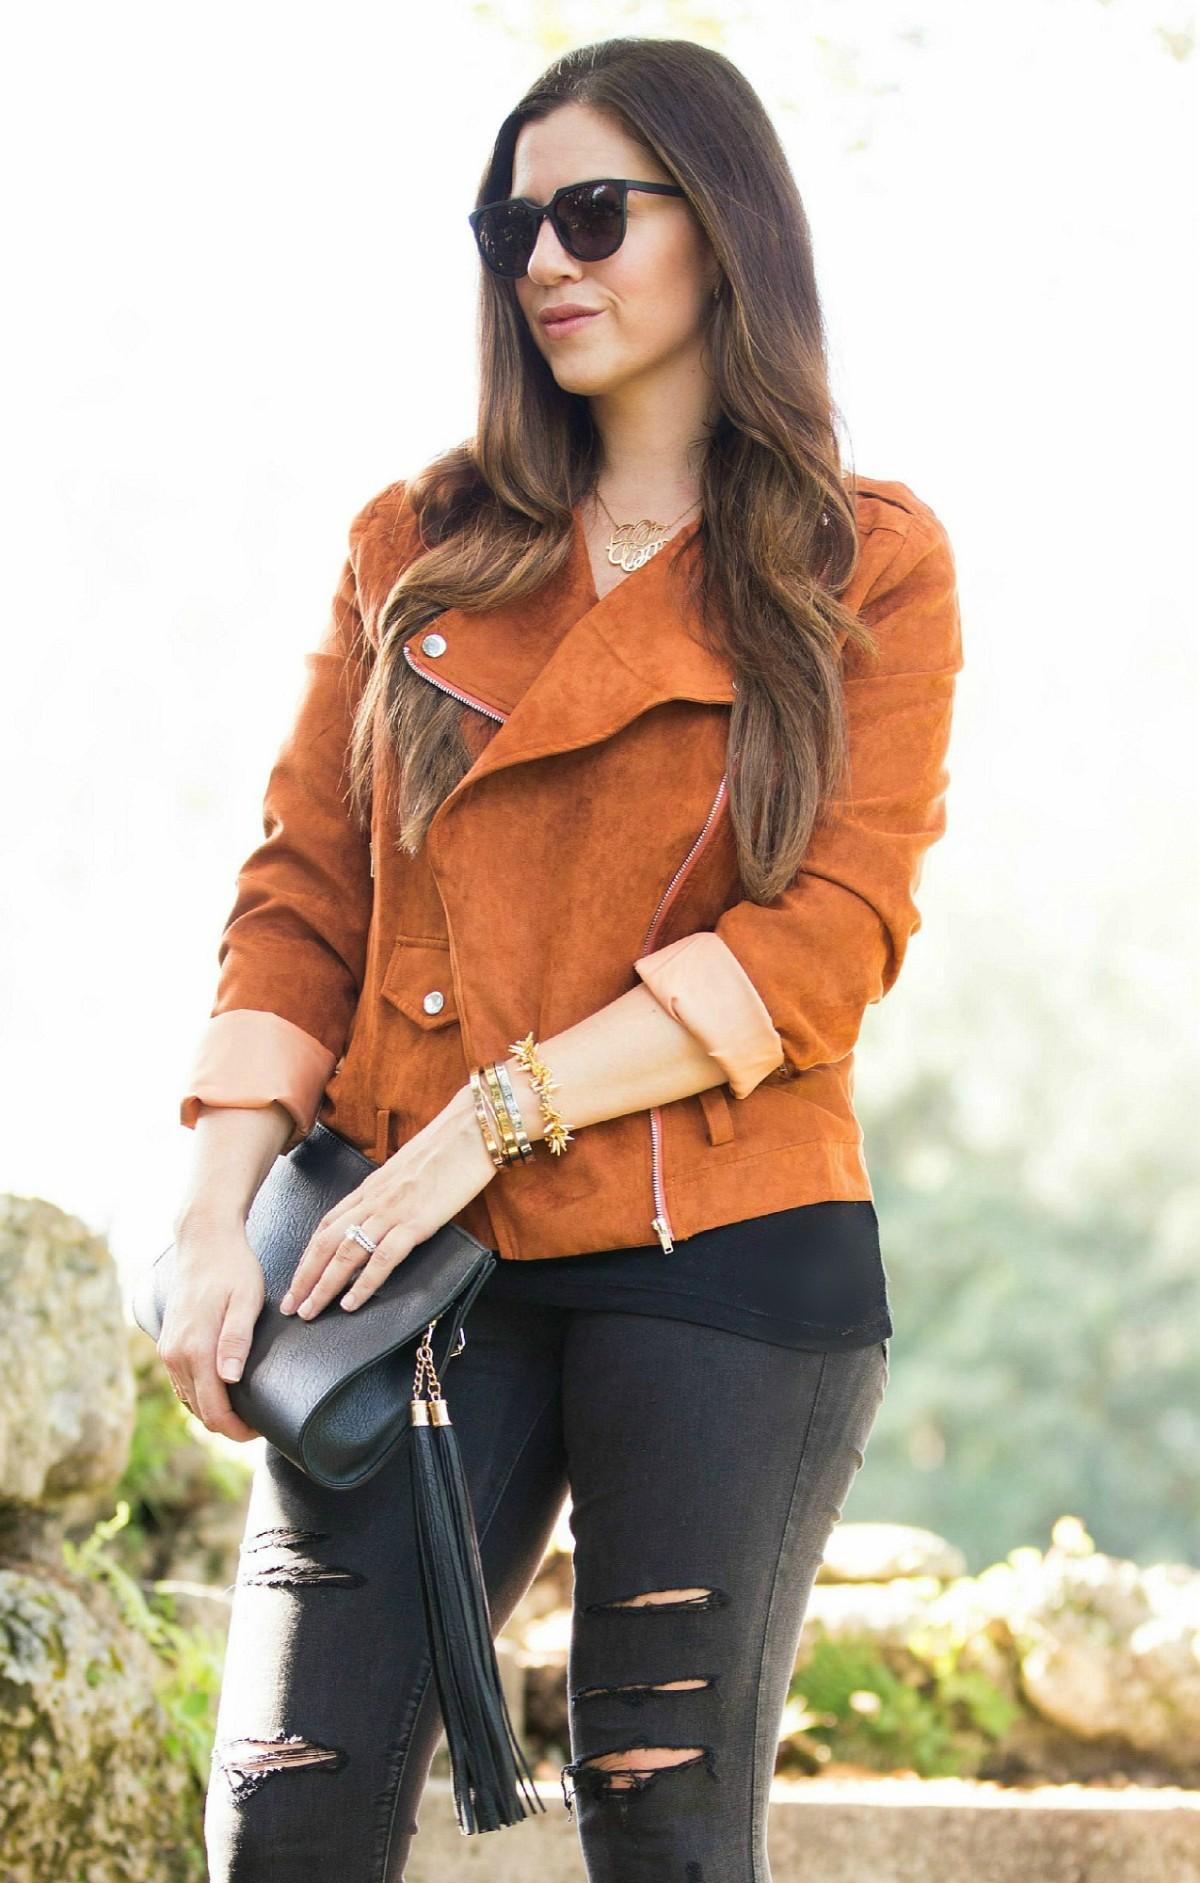 fall outfit inspiration, Jaime Cittadino, street style inspo